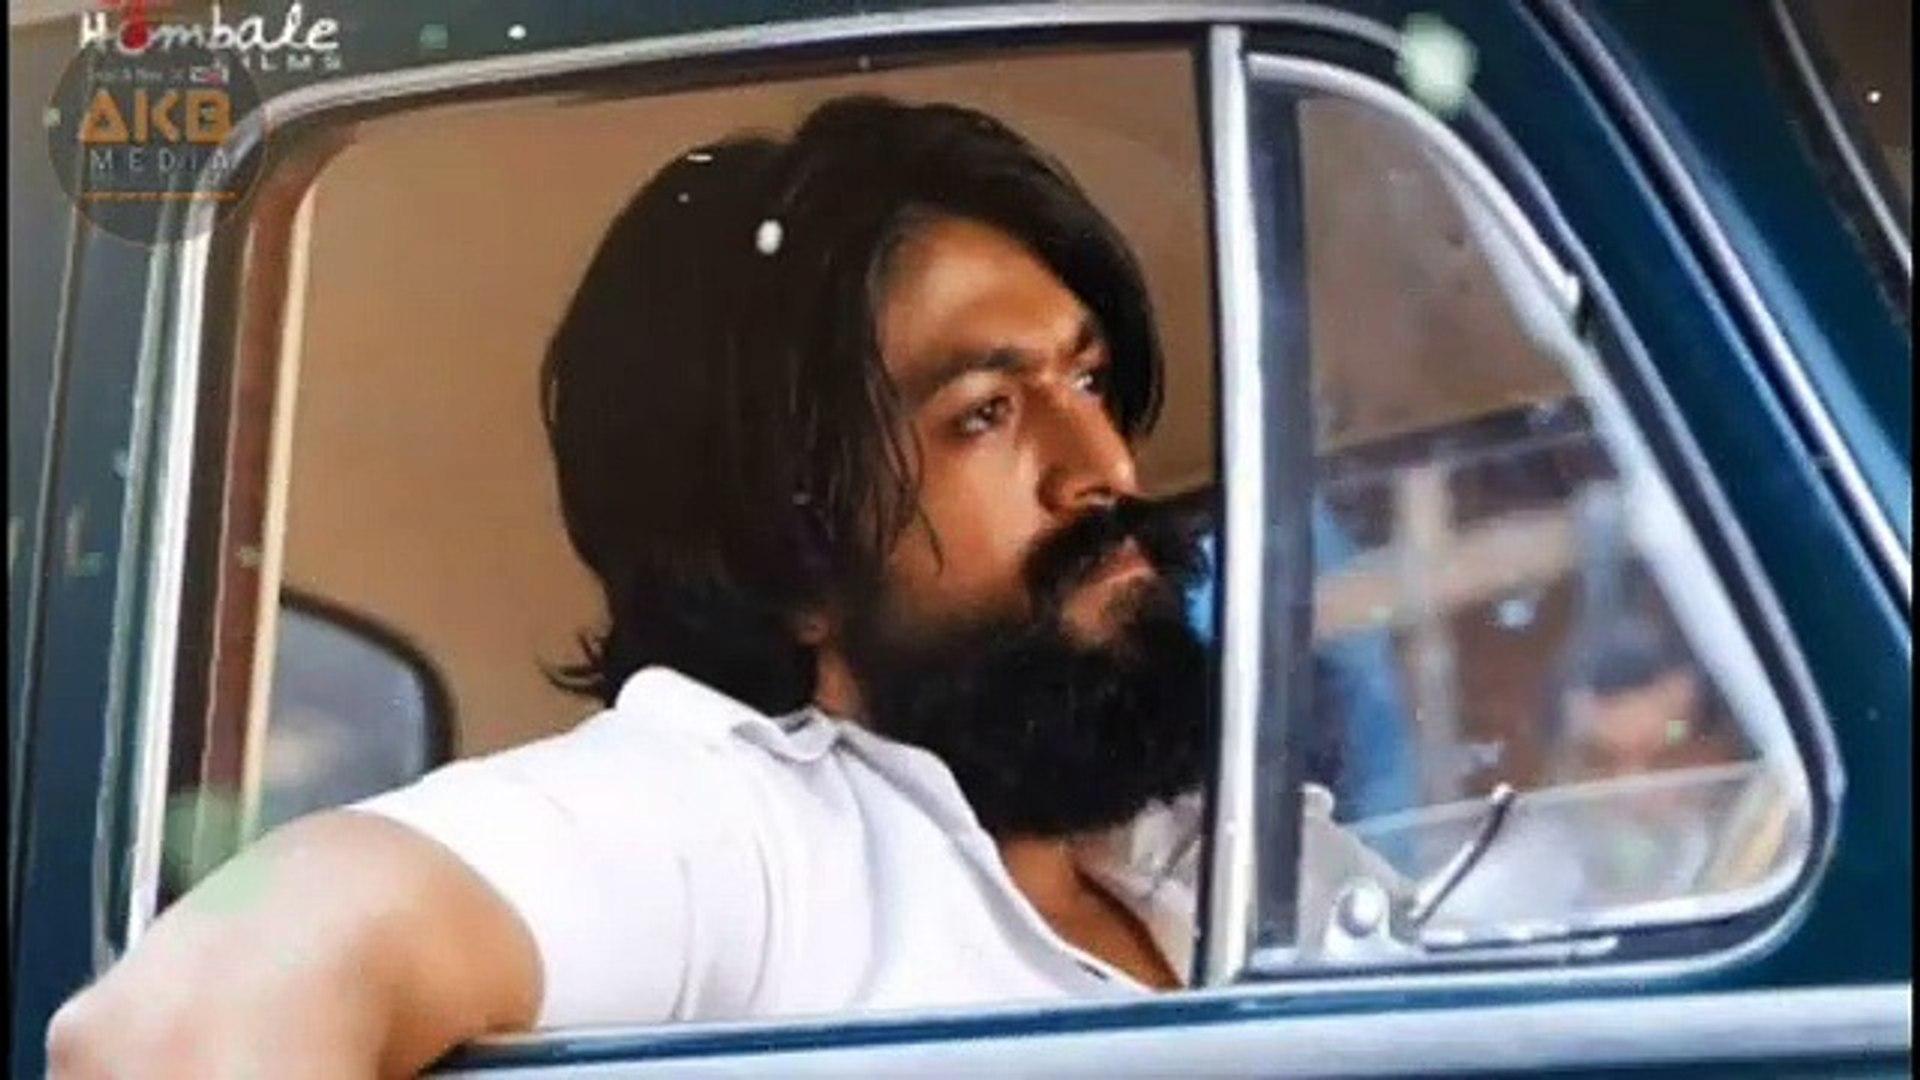 KGF 2 Trailer   KGF Chapter 2 Trailer   Hindi   Yash   Sanjay Dutt   KGF 2 Official Trailer, Teaser